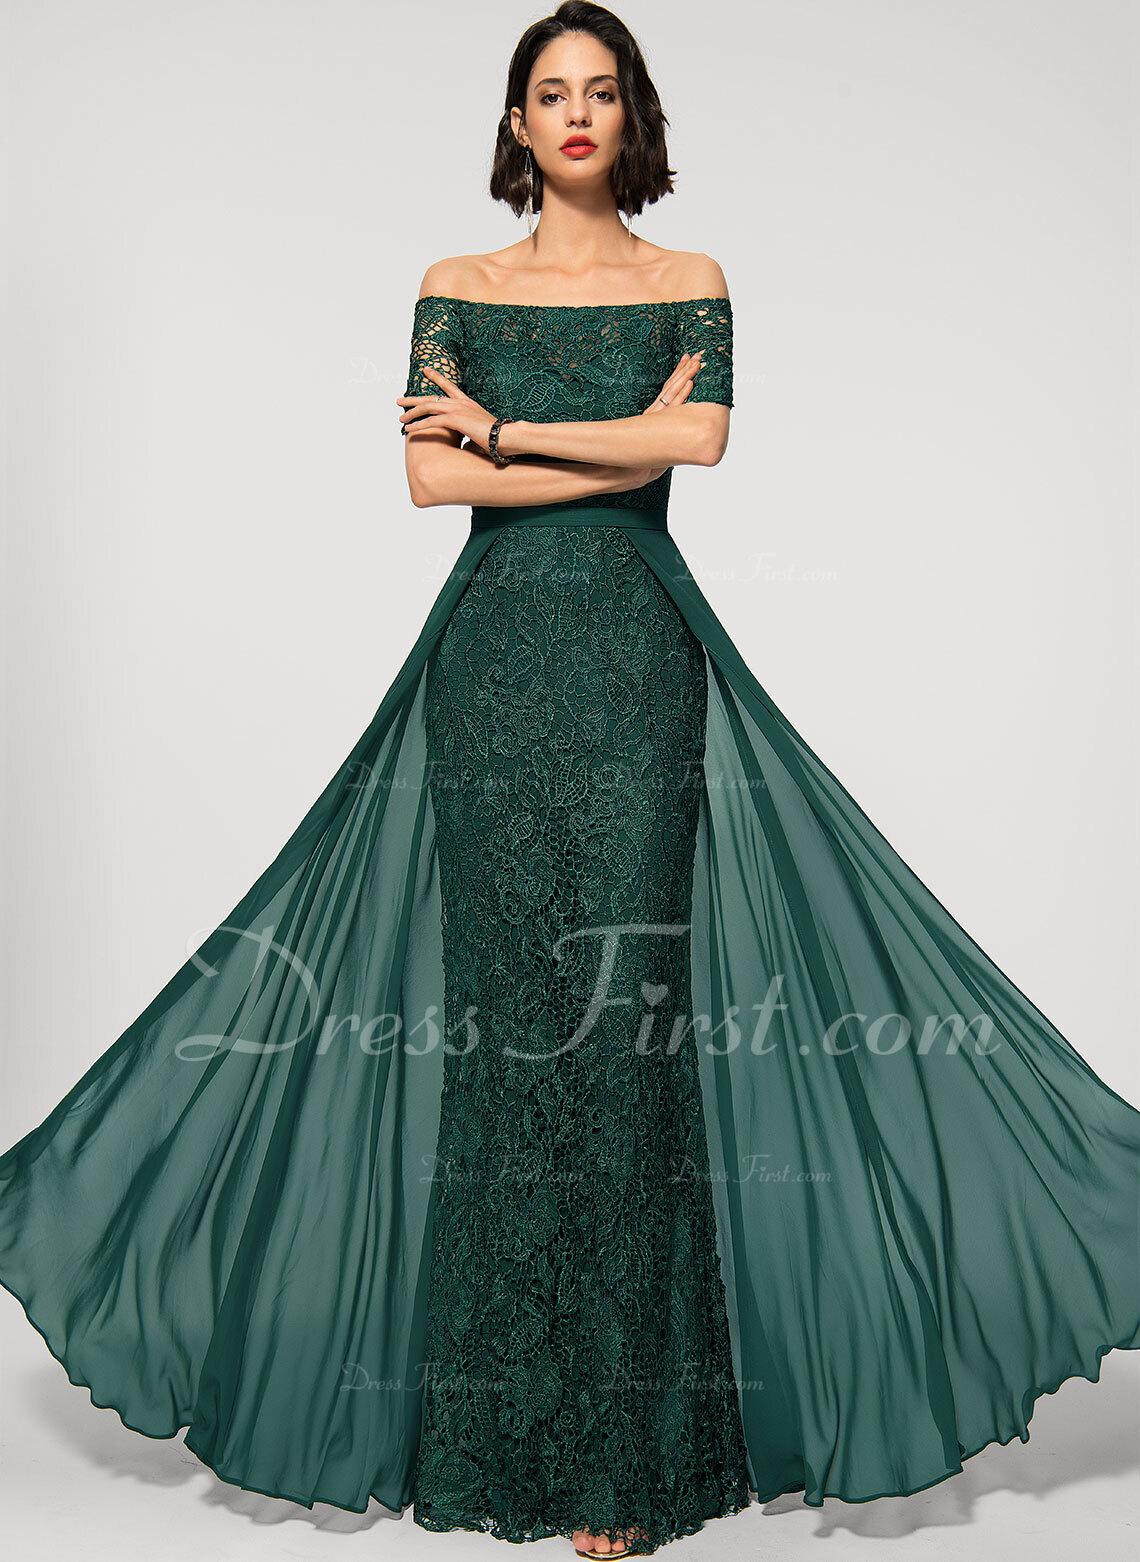 Sheath/Column Off-the-Shoulder Floor-Length Chiffon Lace Evening Dress